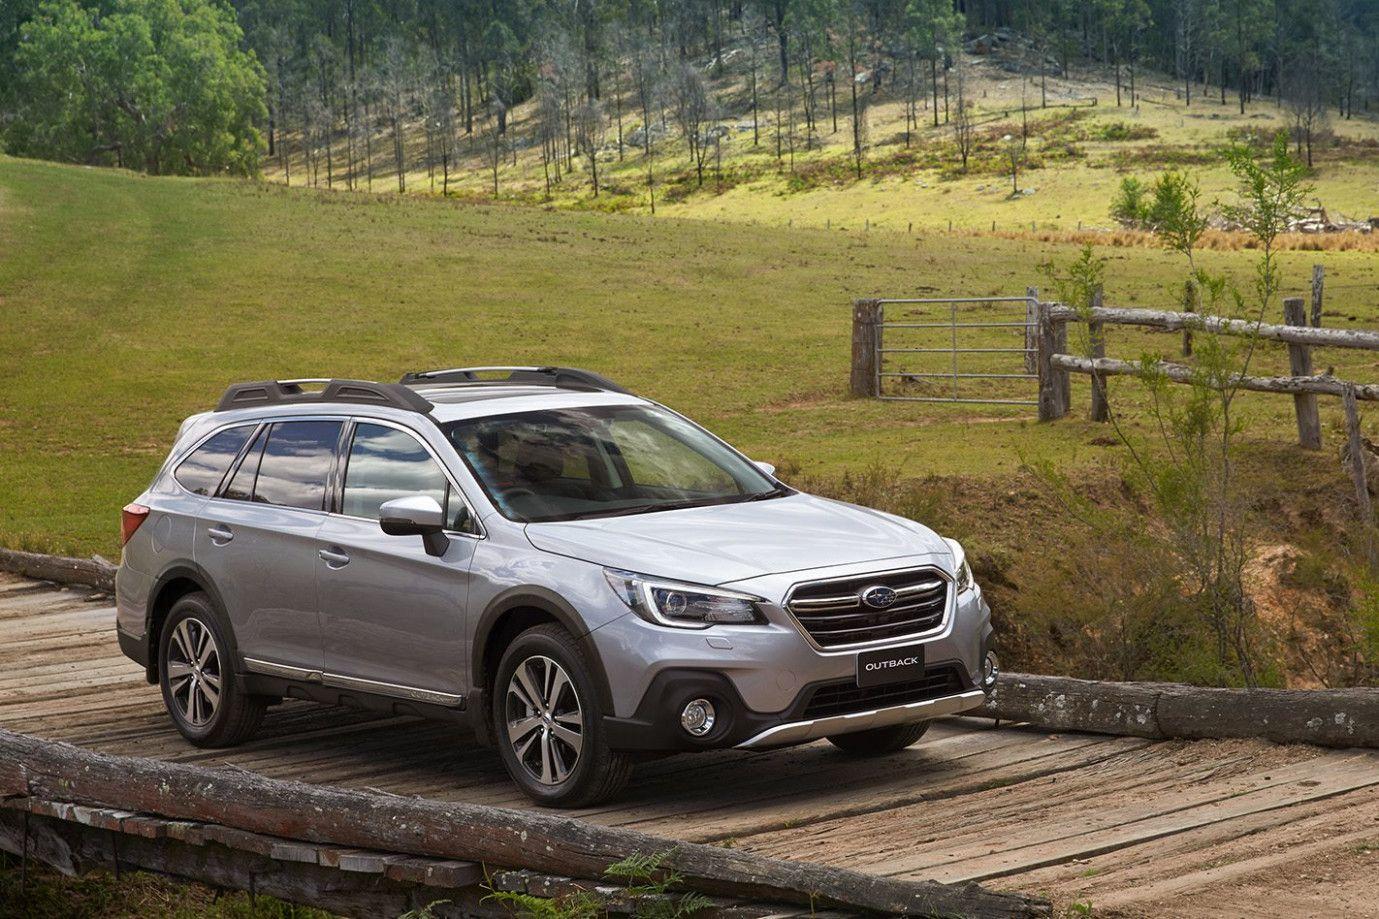 2020 Subaru Outback 3 6r In 2020 Subaru Outback Subaru Legacy Subaru